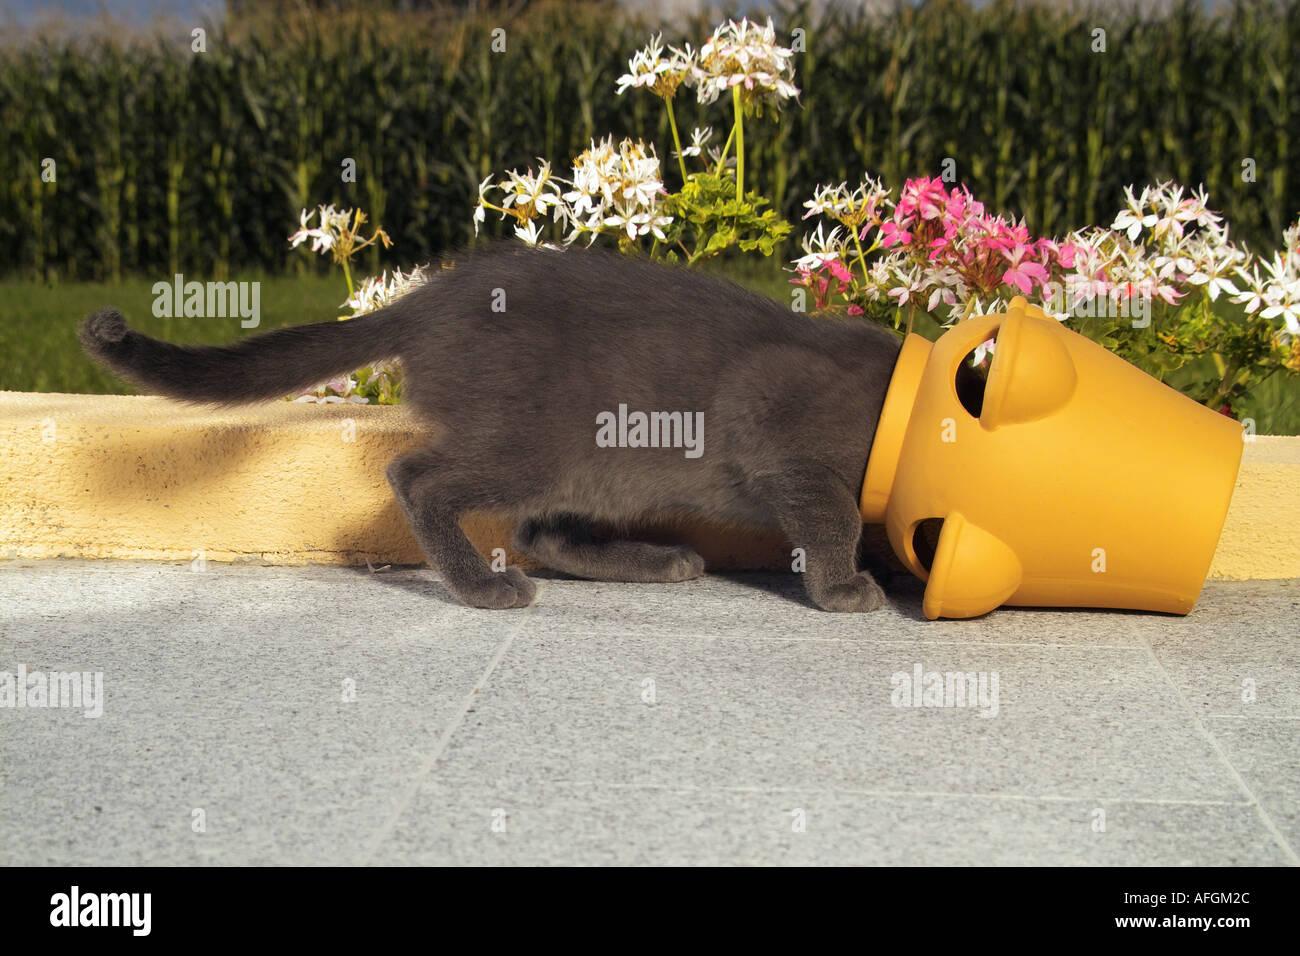 Cat Graues Katzchen Kopf In Einen Blumentopf Stockfoto Bild